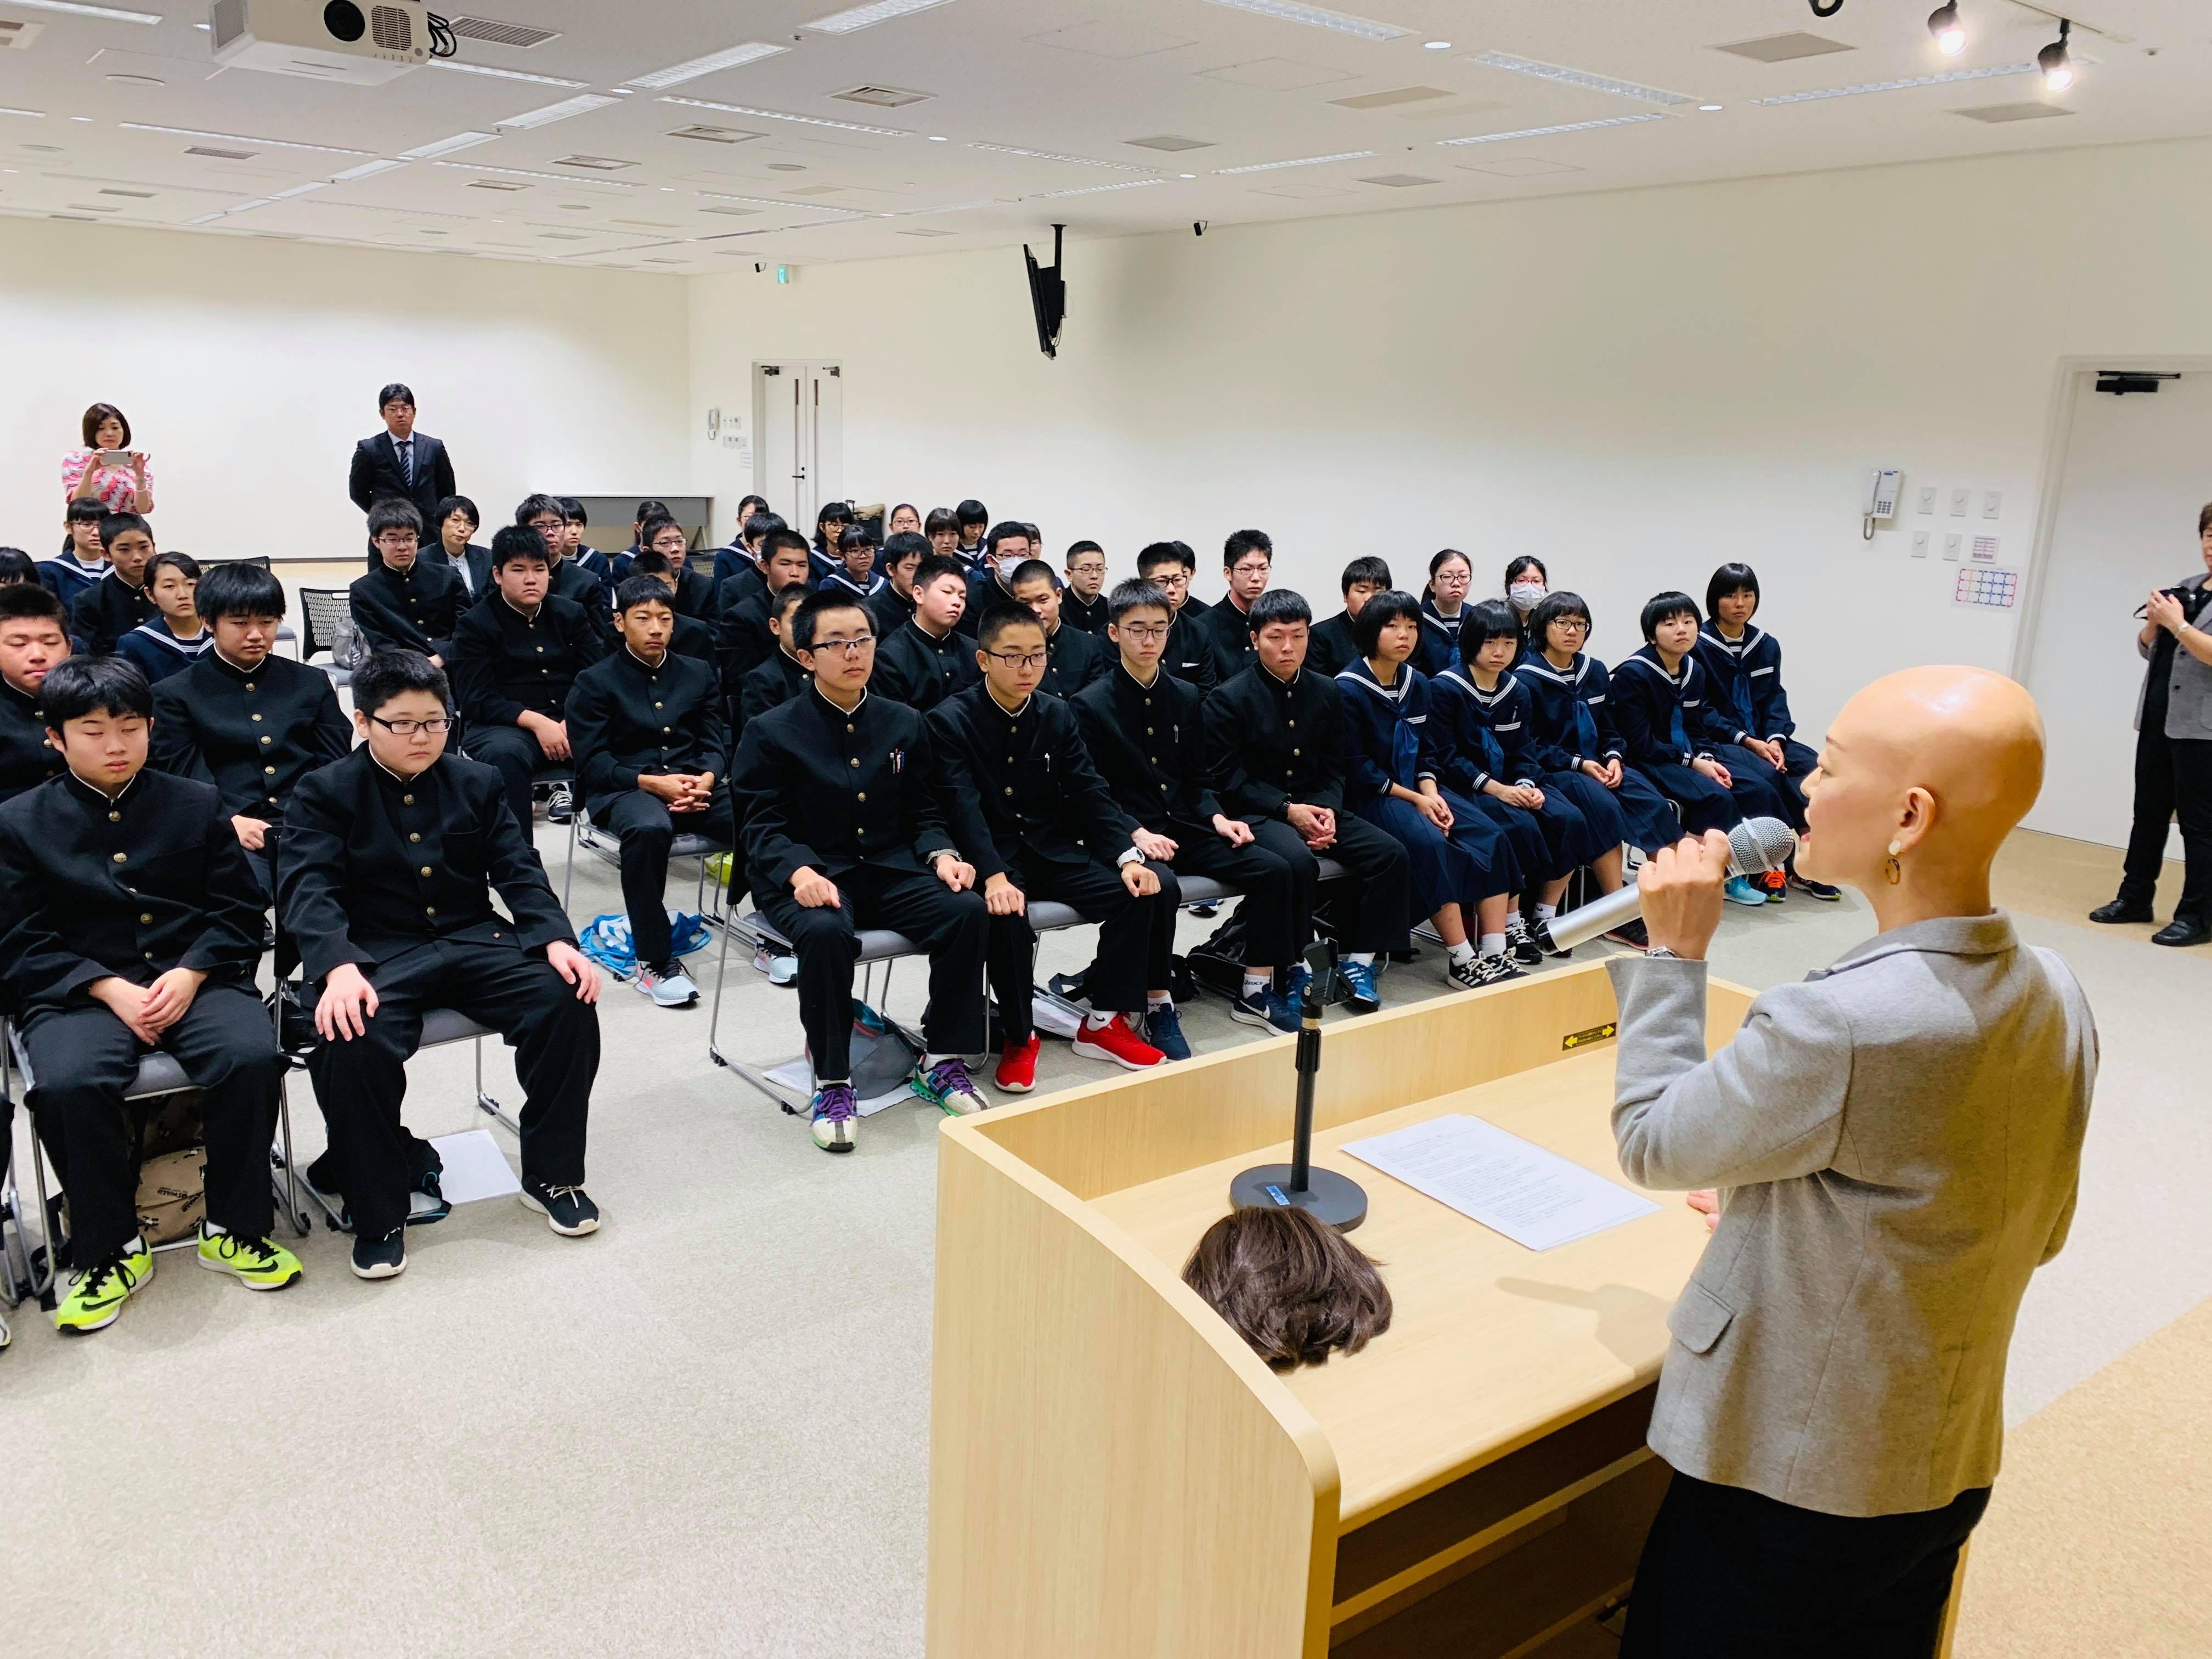 45649518 750979951912005 7002906264451678208 n - 2018年11月7日青森県東北中学校AFS(AOsukiフューチャーズゼミ)開催しました。